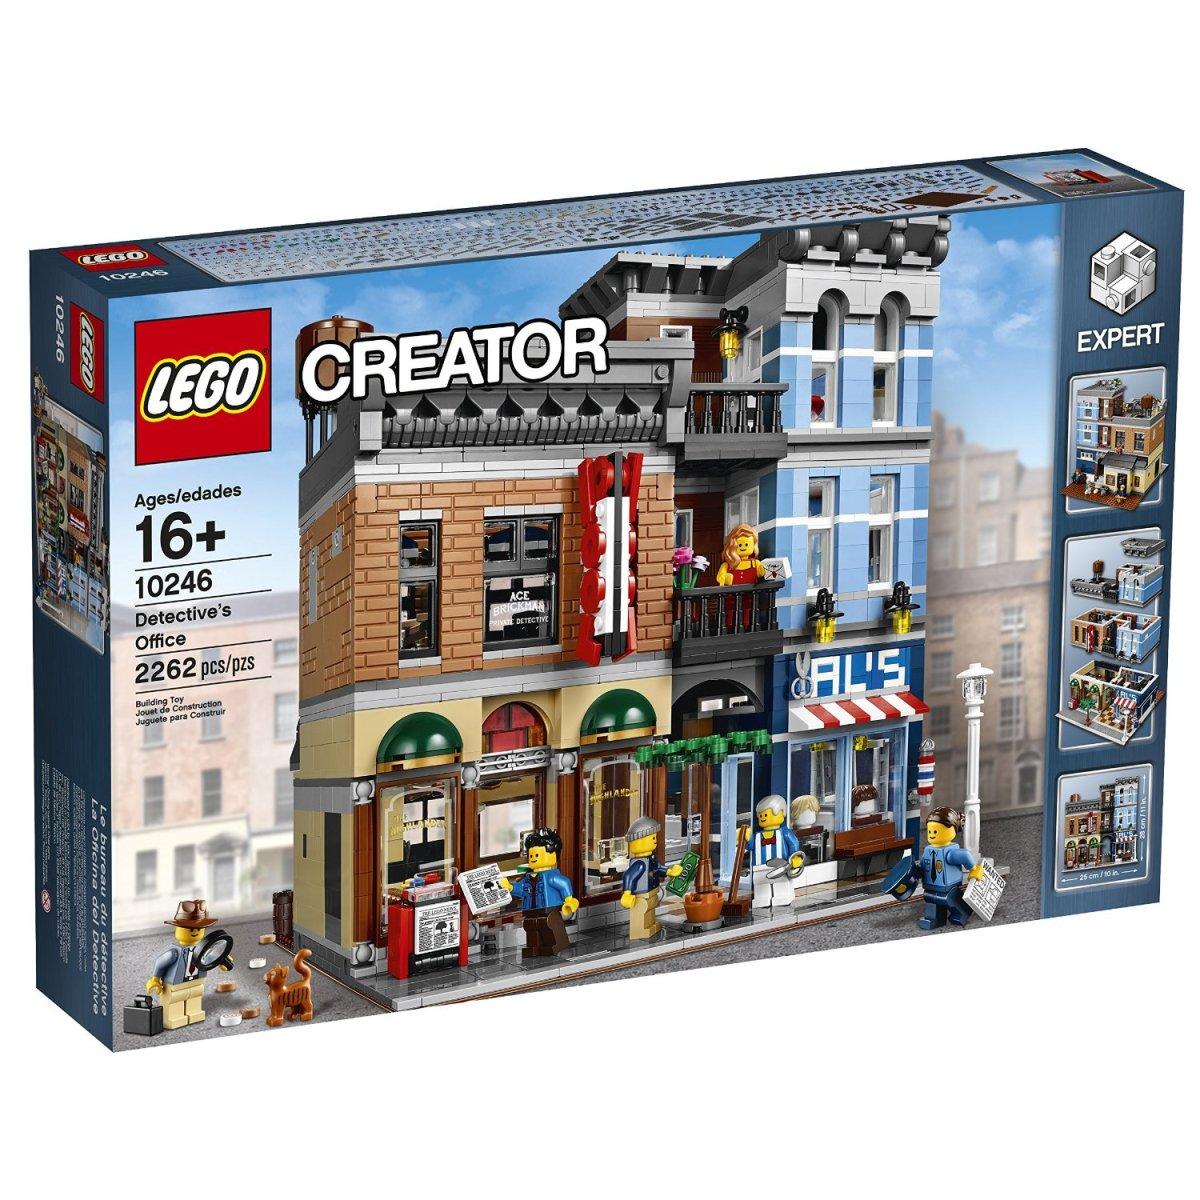 lego creator detective 39 s office modular building hubpages. Black Bedroom Furniture Sets. Home Design Ideas